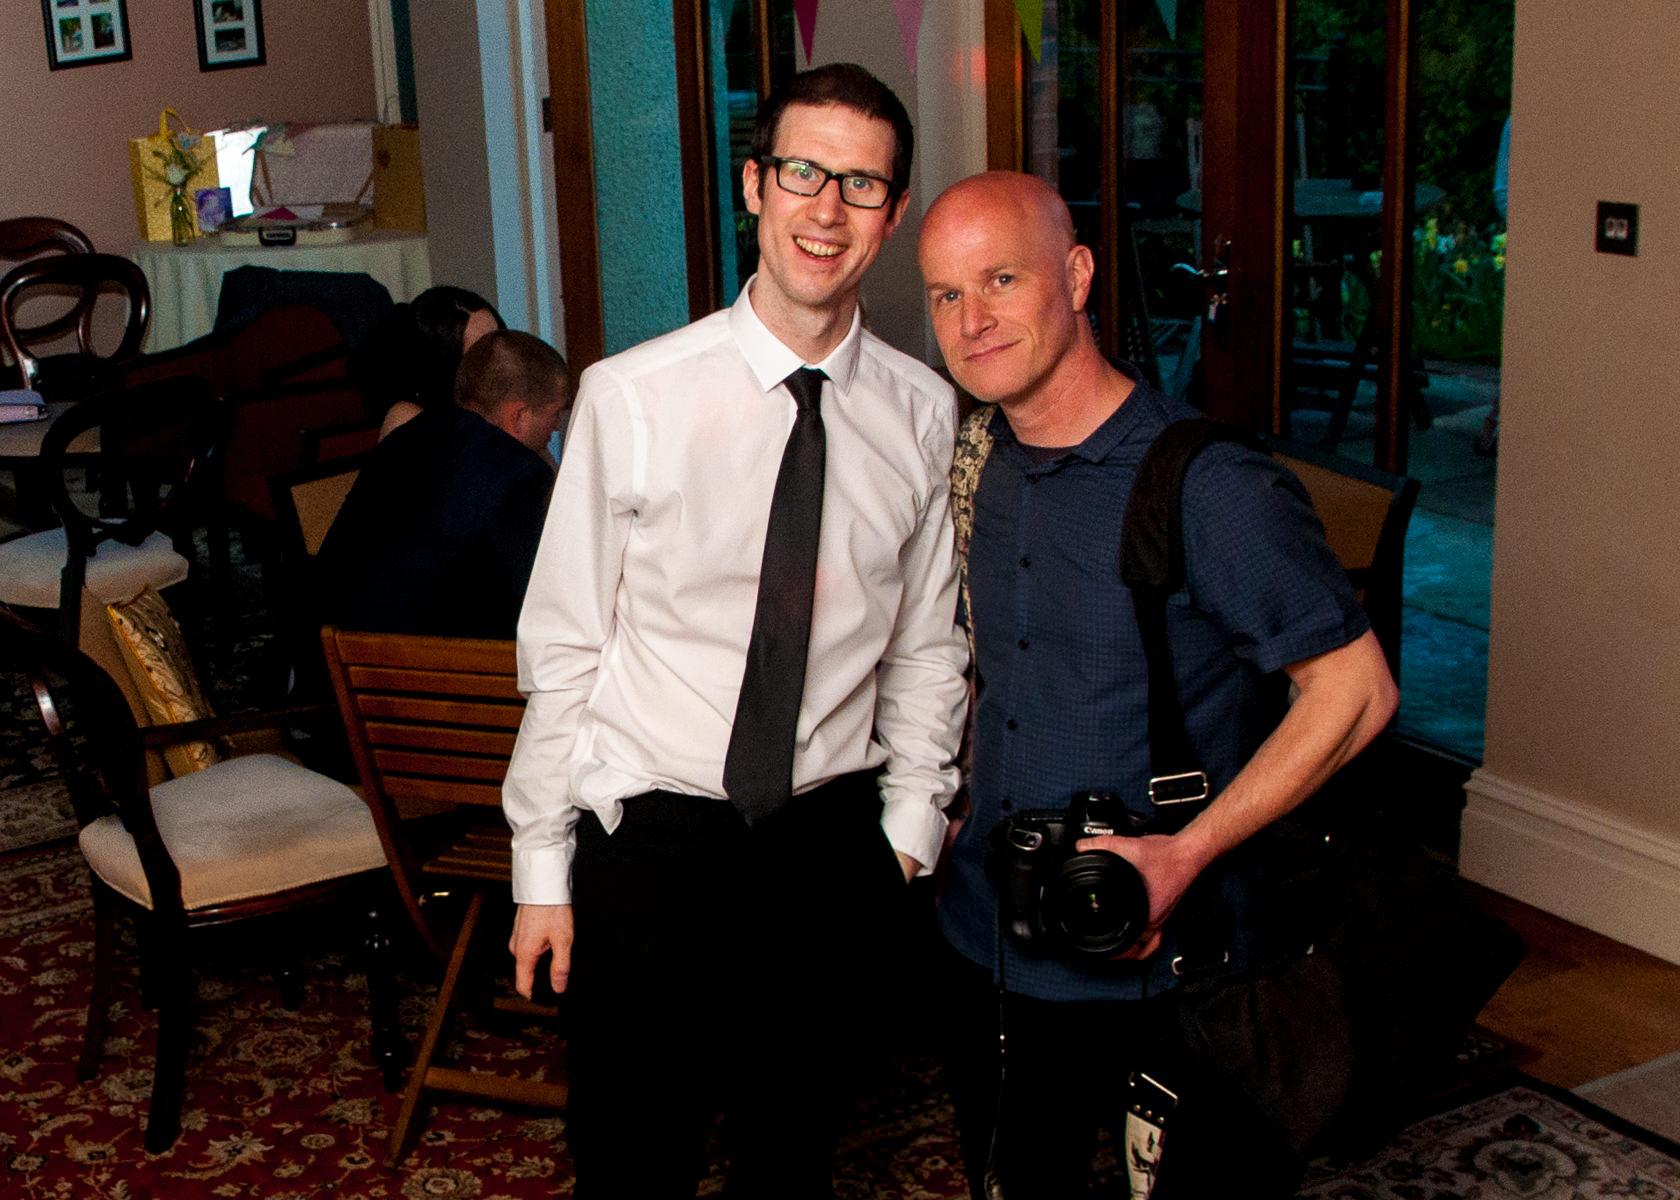 Wedding-DJ-Adam-Carr-and-Wedding-Photographer-Steve-Gerrard